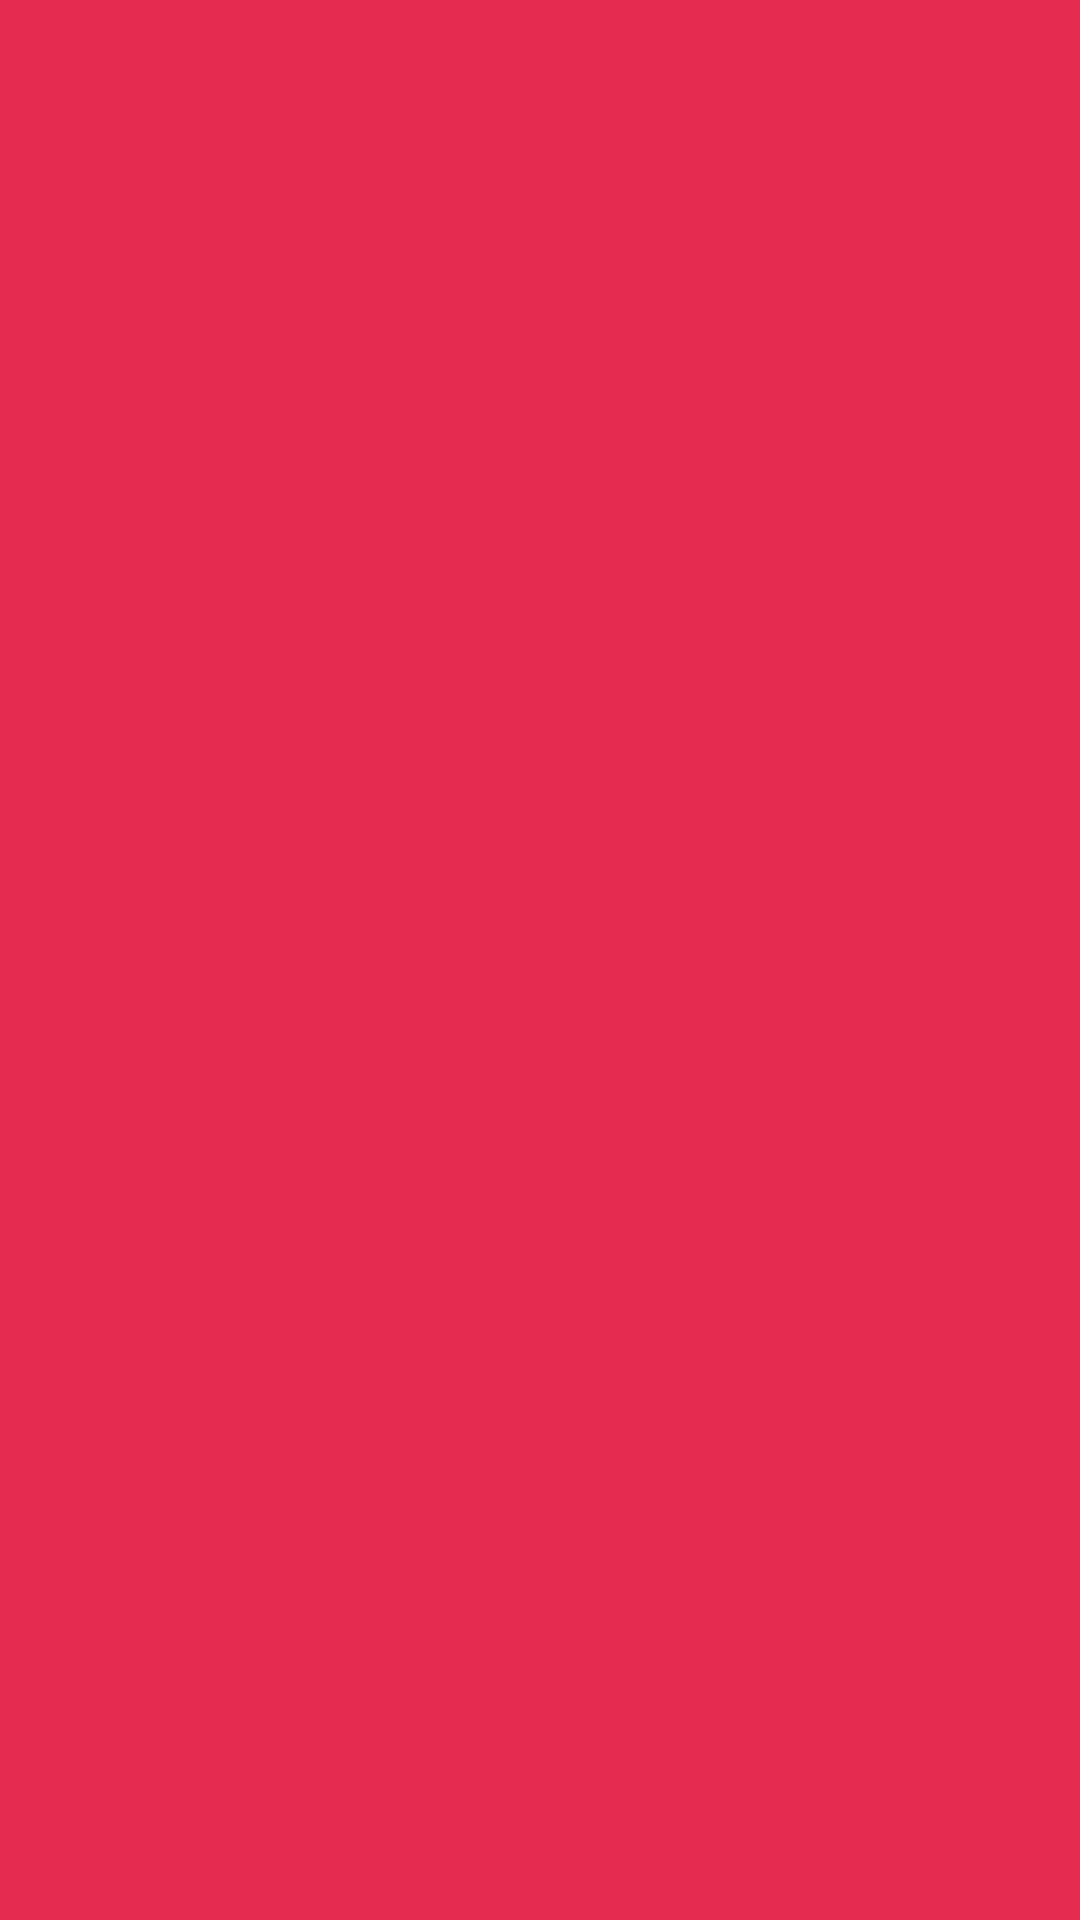 1080x1920 Amaranth Solid Color Background